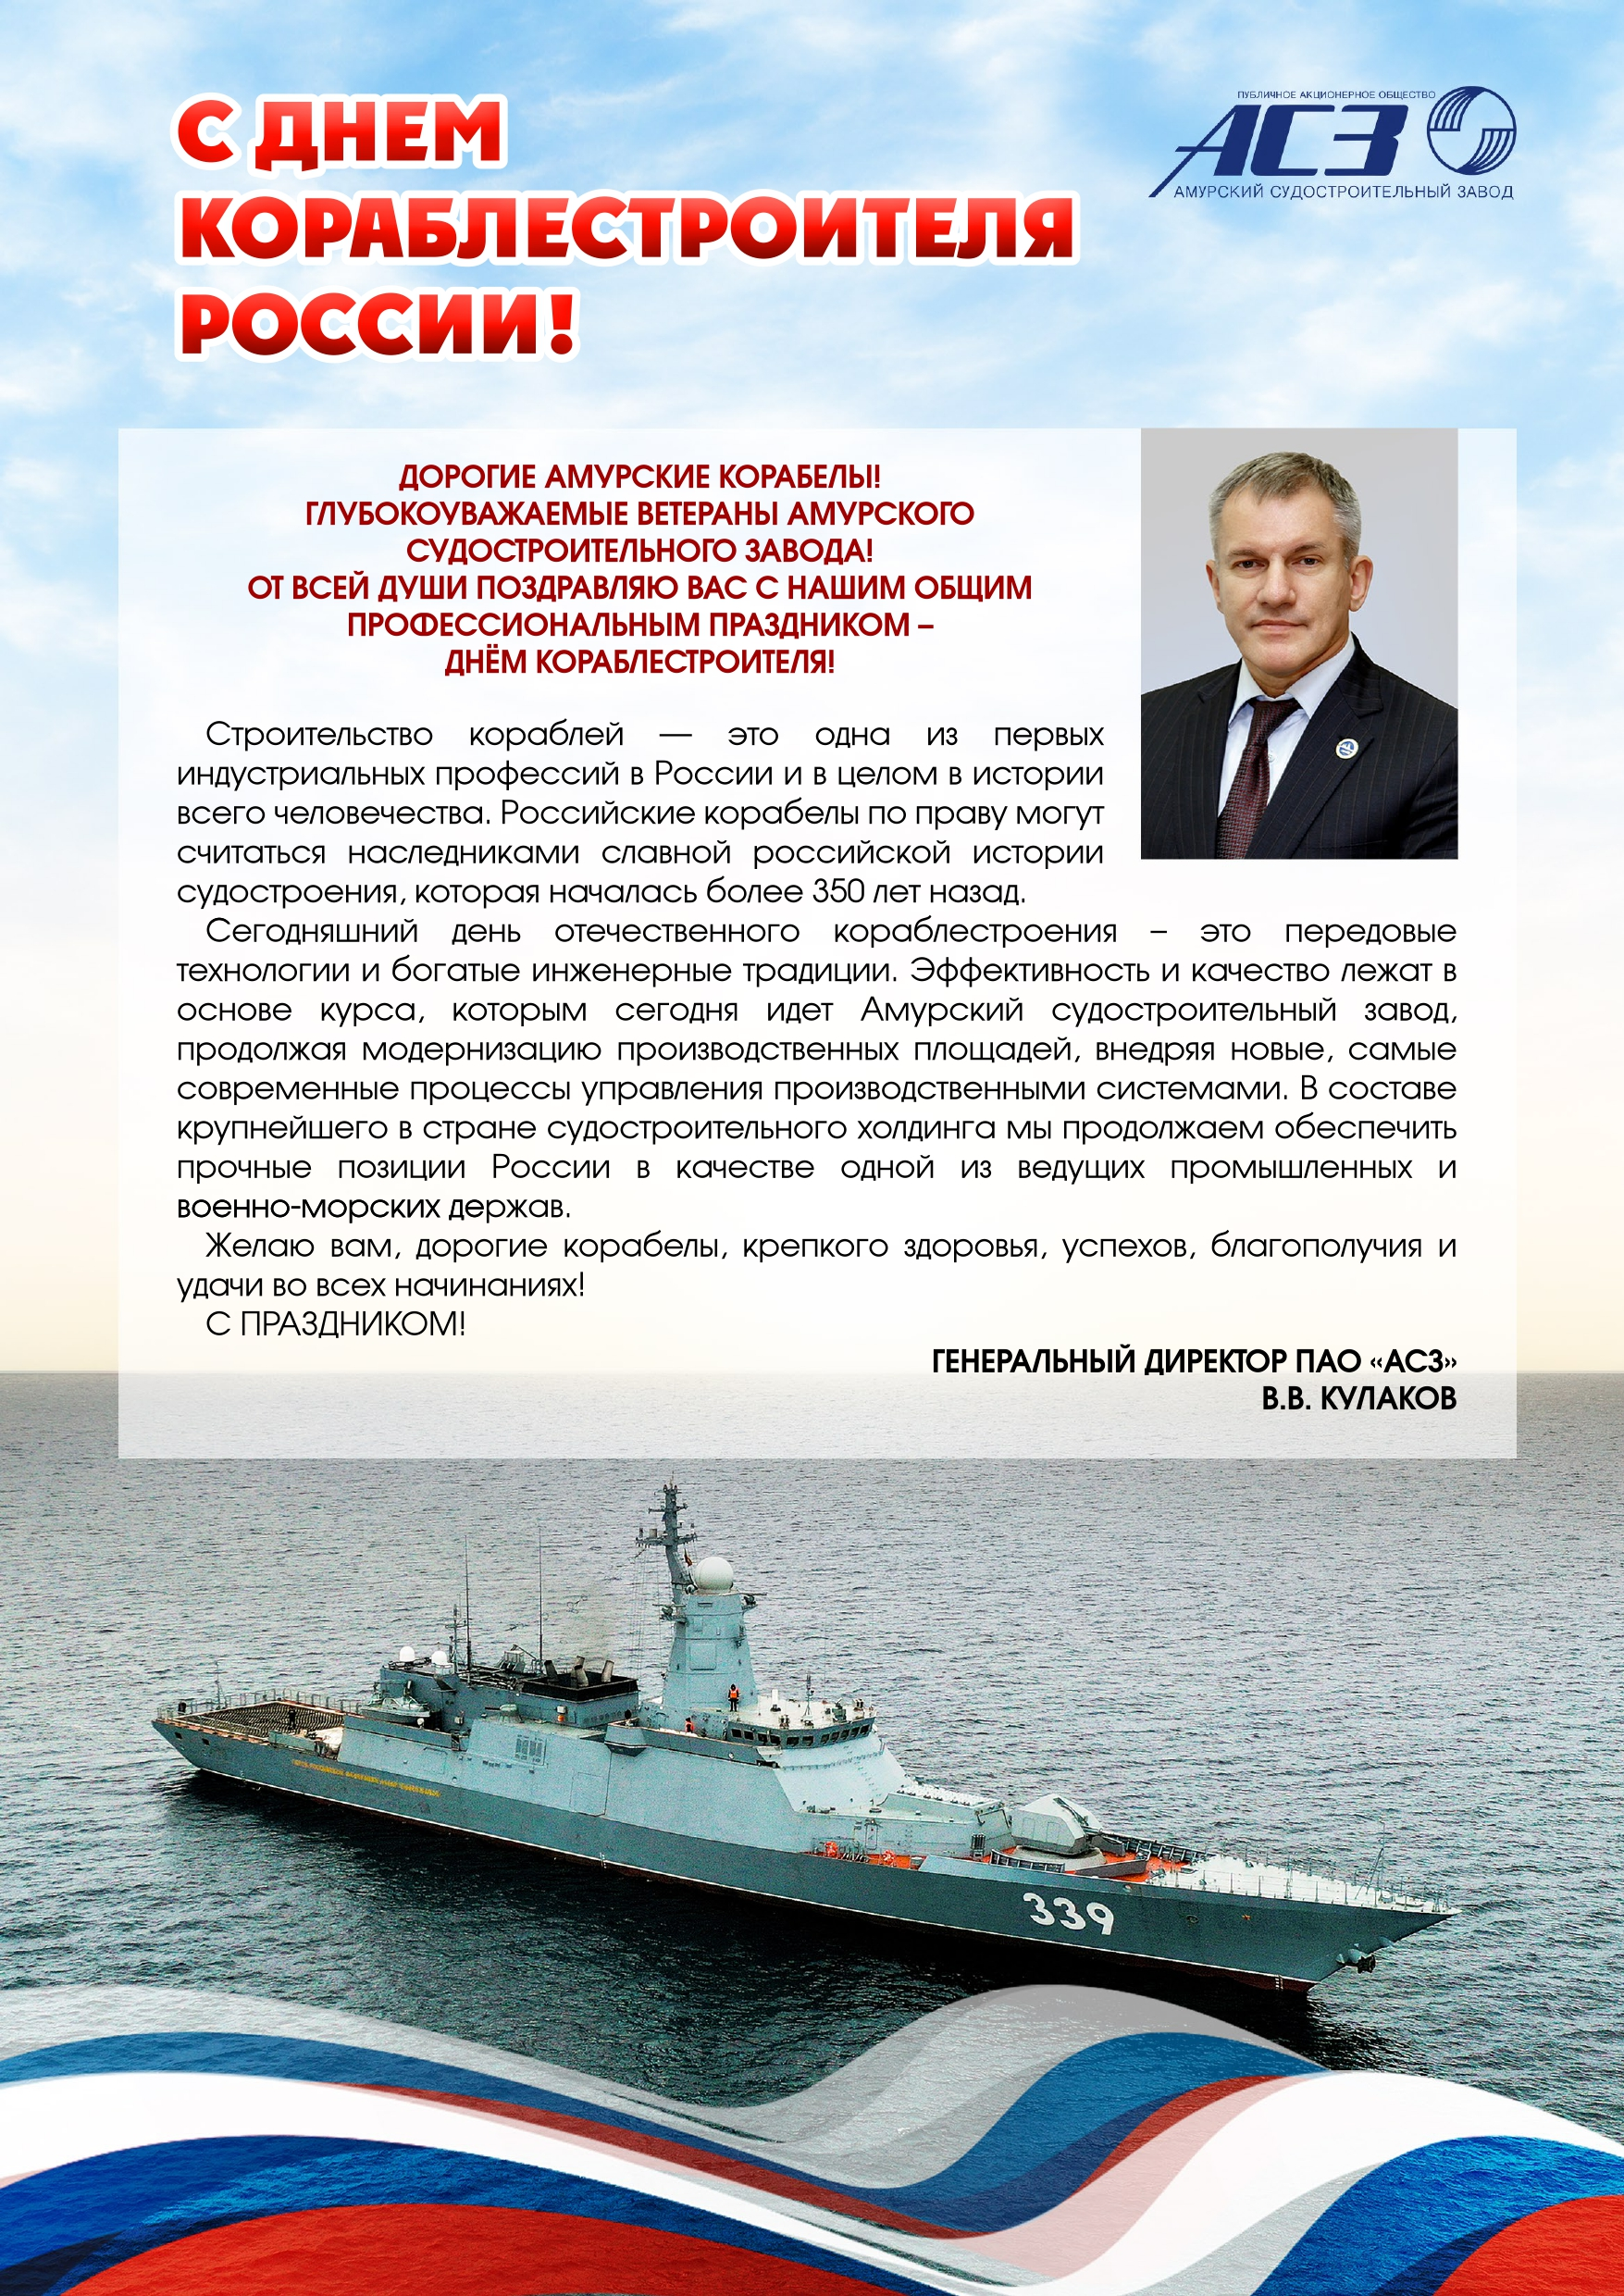 Плакат ко Дню Кораблестроителя (Кулаков) 2021_page-0001